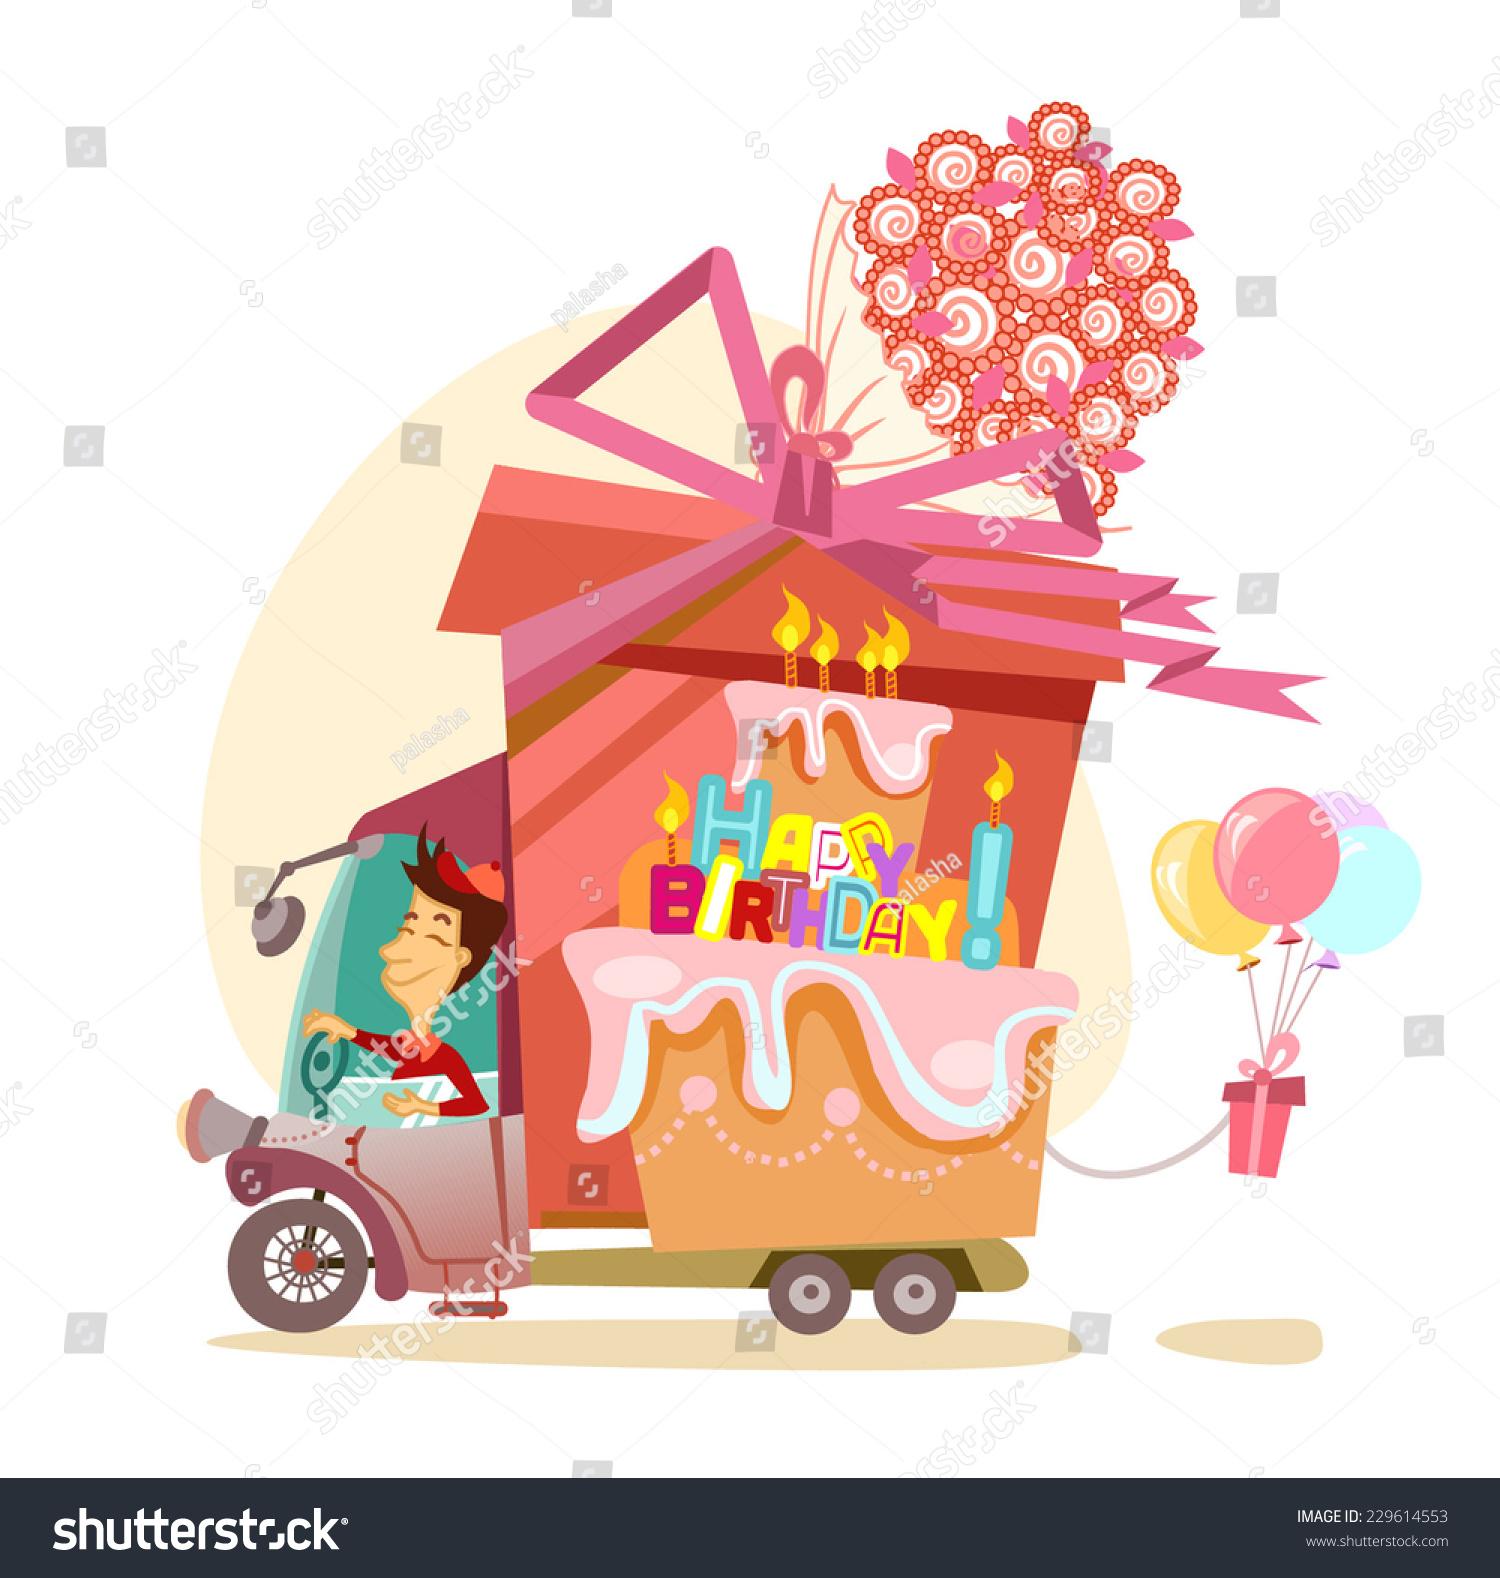 Cartoon driver big gift balloons flowers stock vector royalty free cartoon driver with big gift balloons flowers and happy birthday cake happy birthday izmirmasajfo